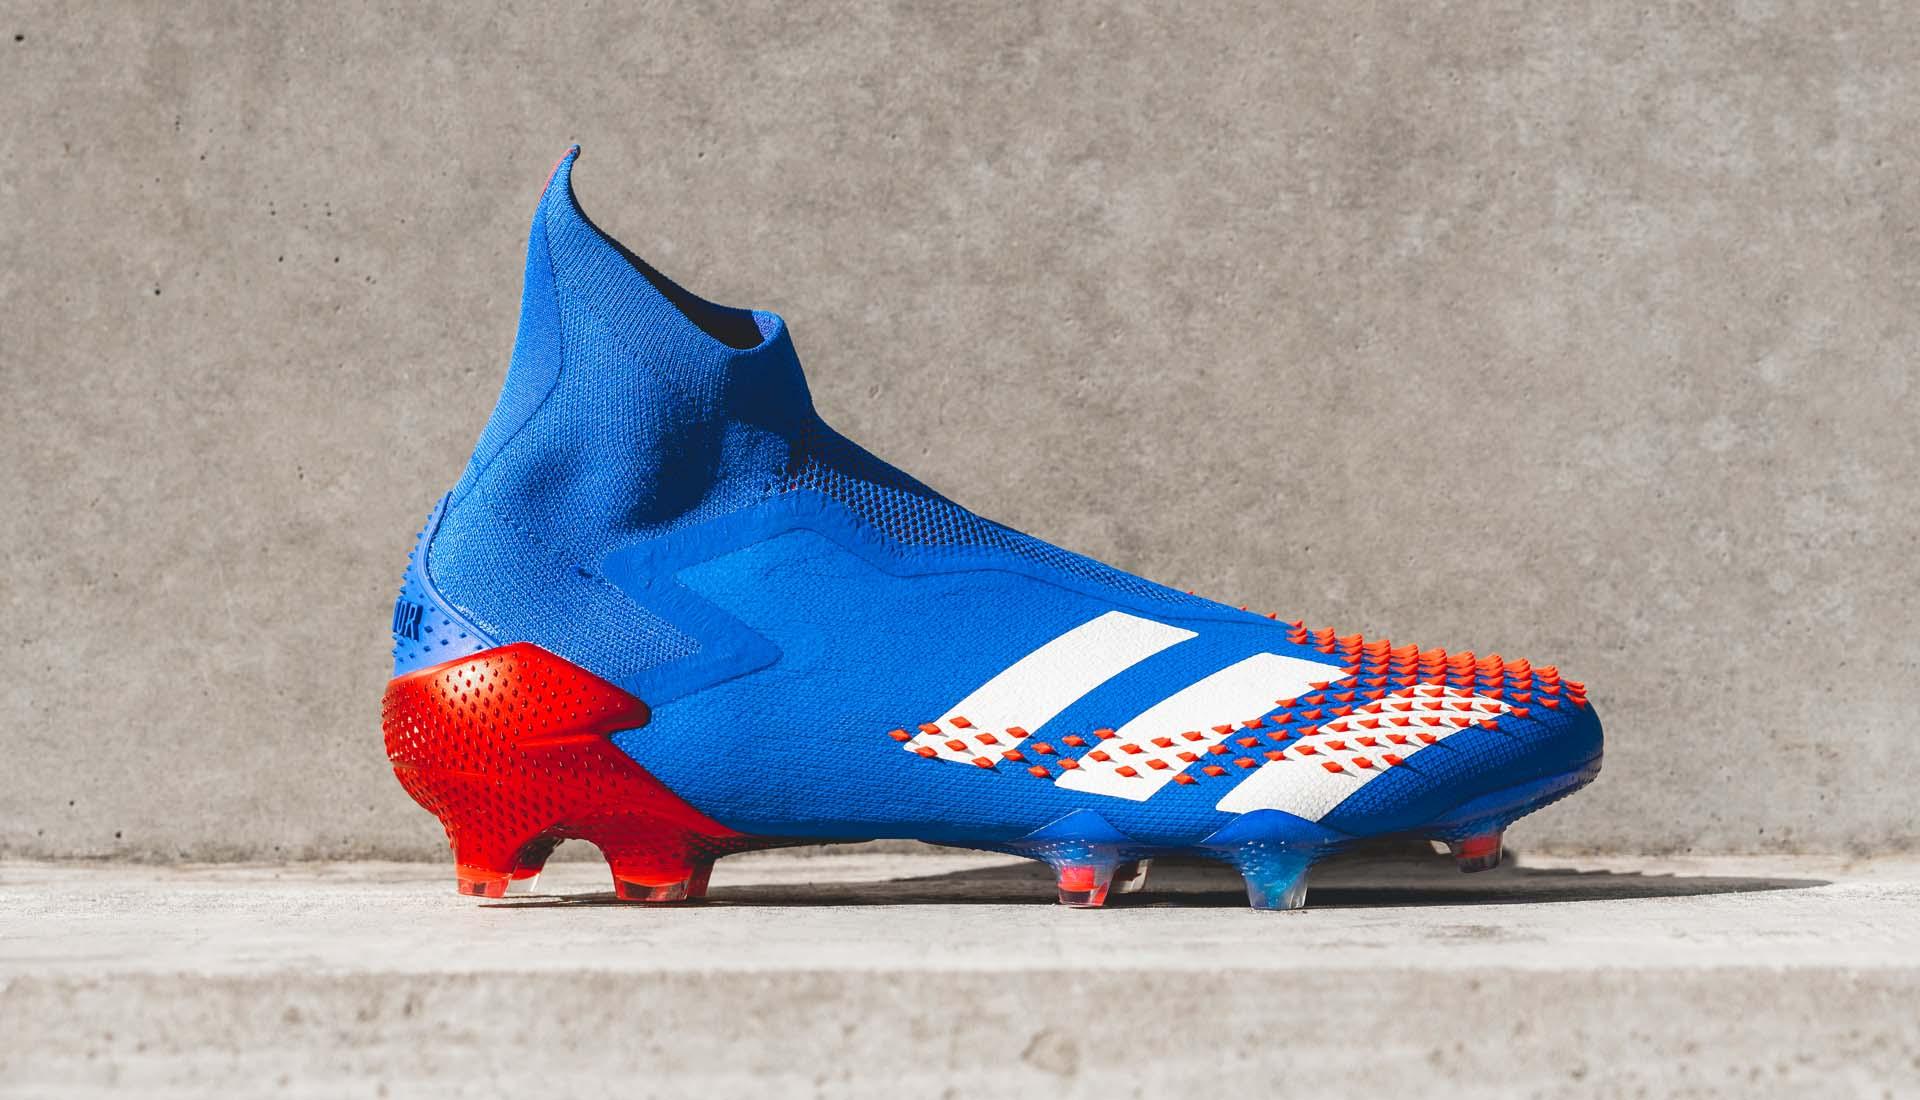 adidas predator pro manuel neuer goalkeeper gloves off 65.